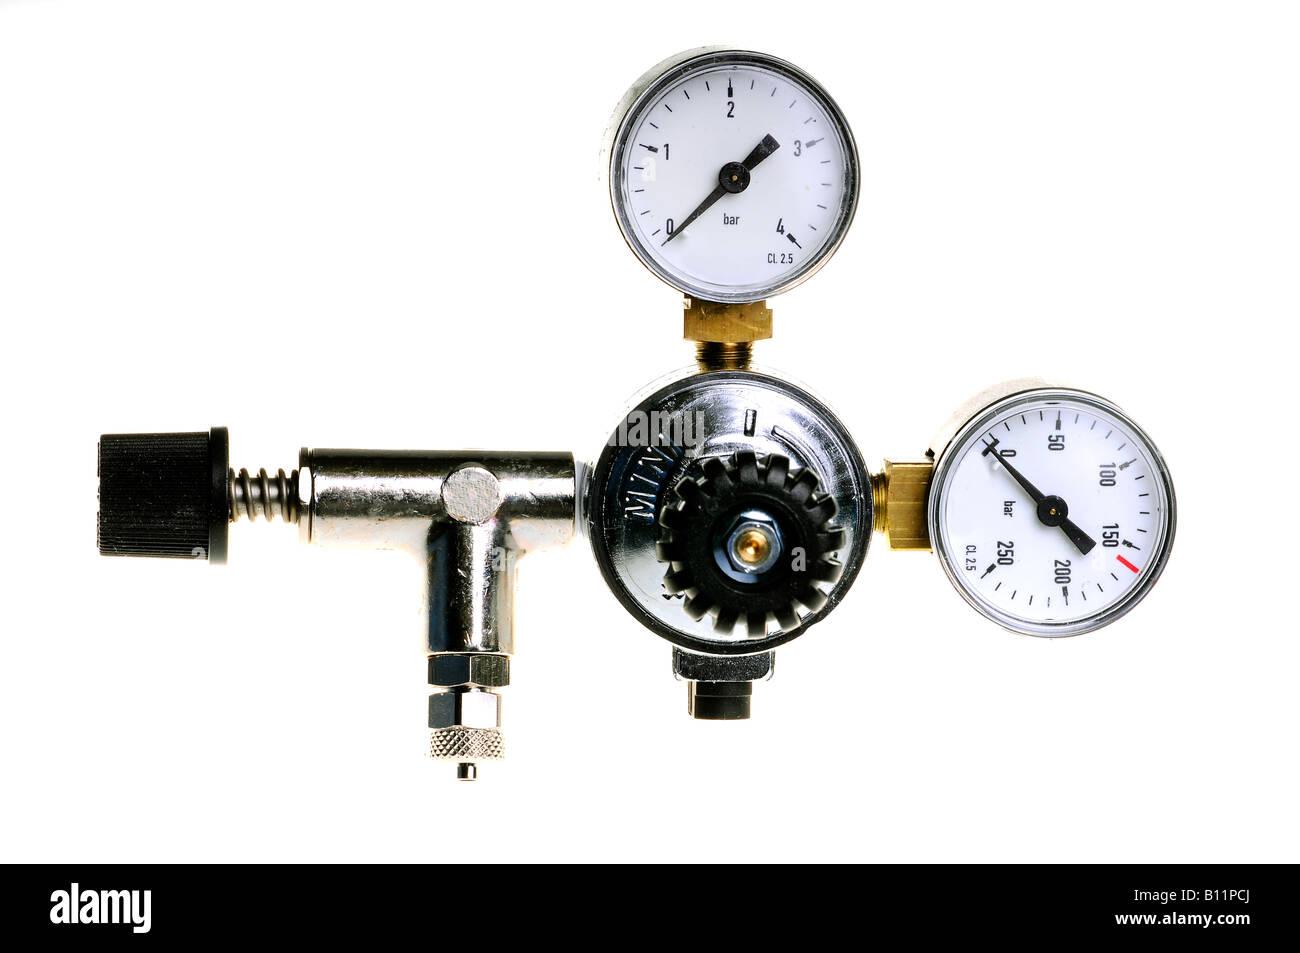 gas cylinder pressure gauge on white background - Stock Image